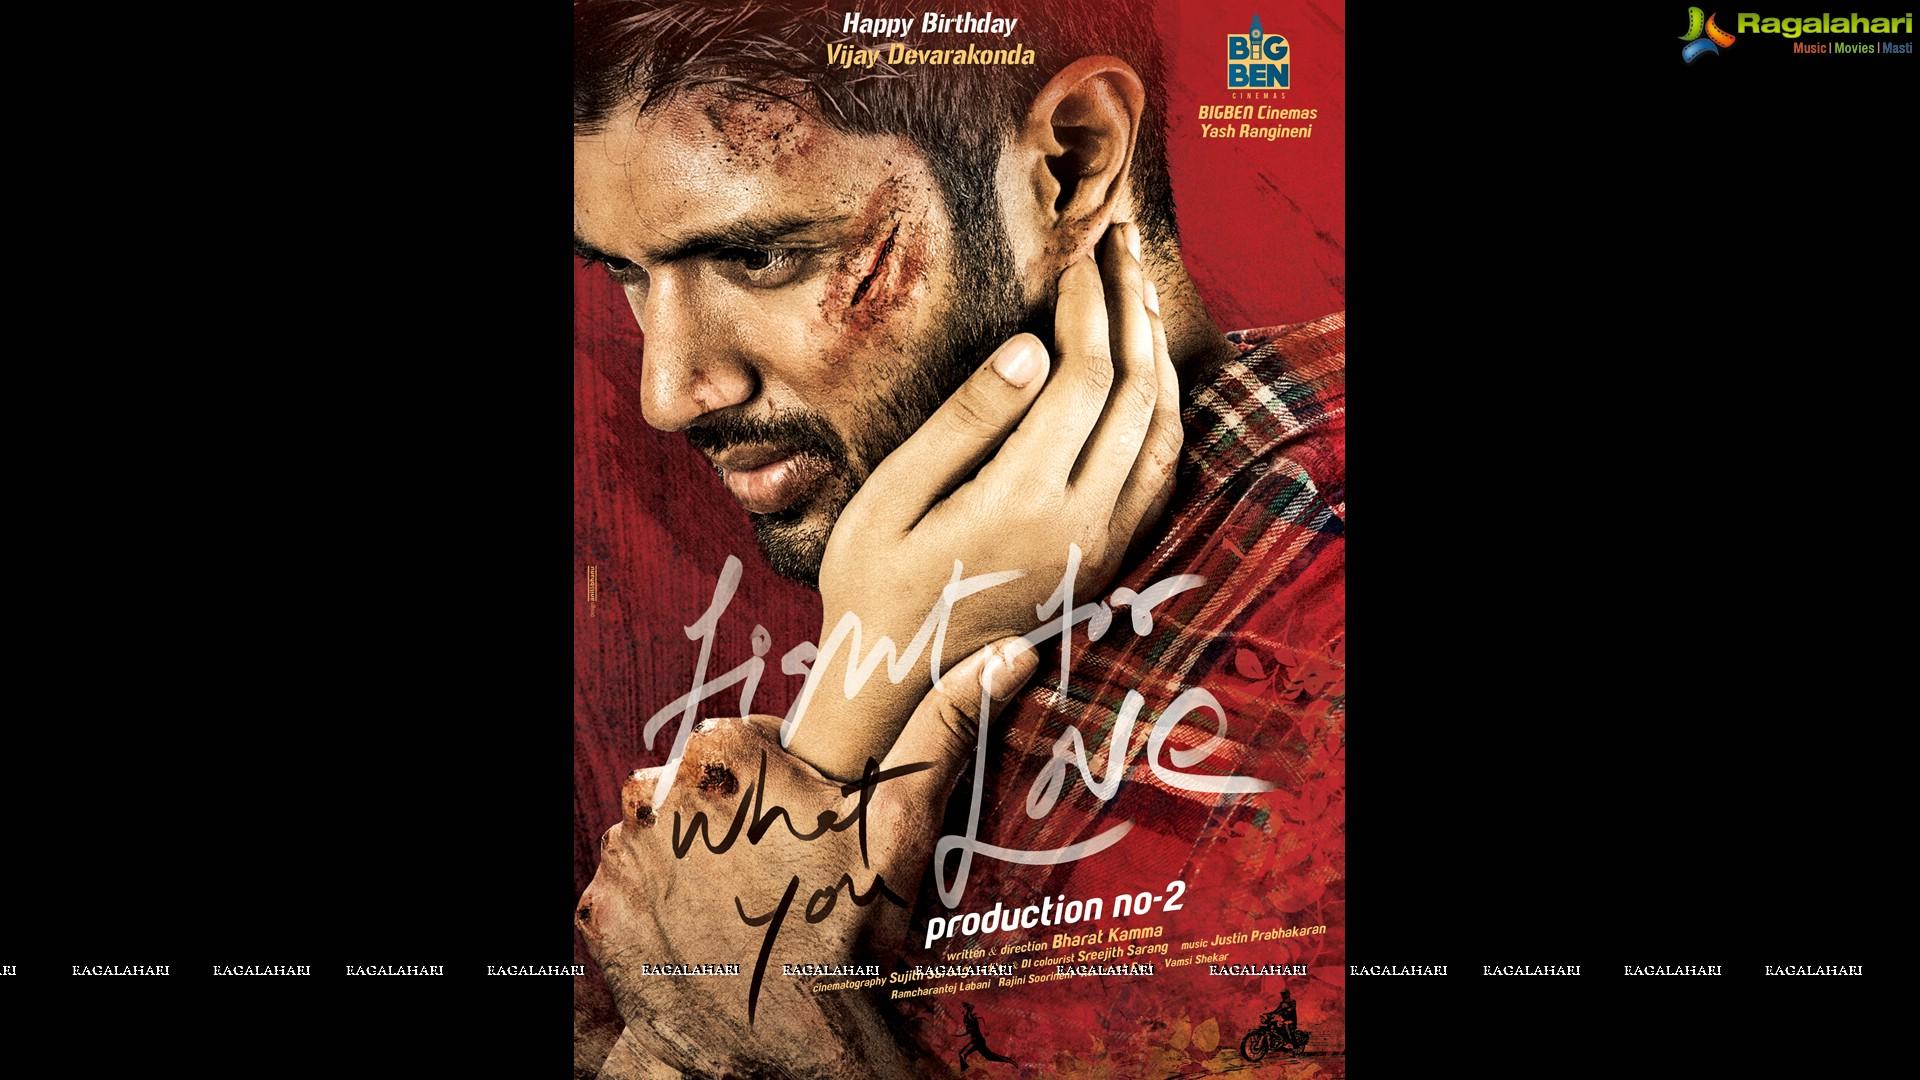 Vijay Devarakonda-BigBen Cinemas Movie Poster Designs